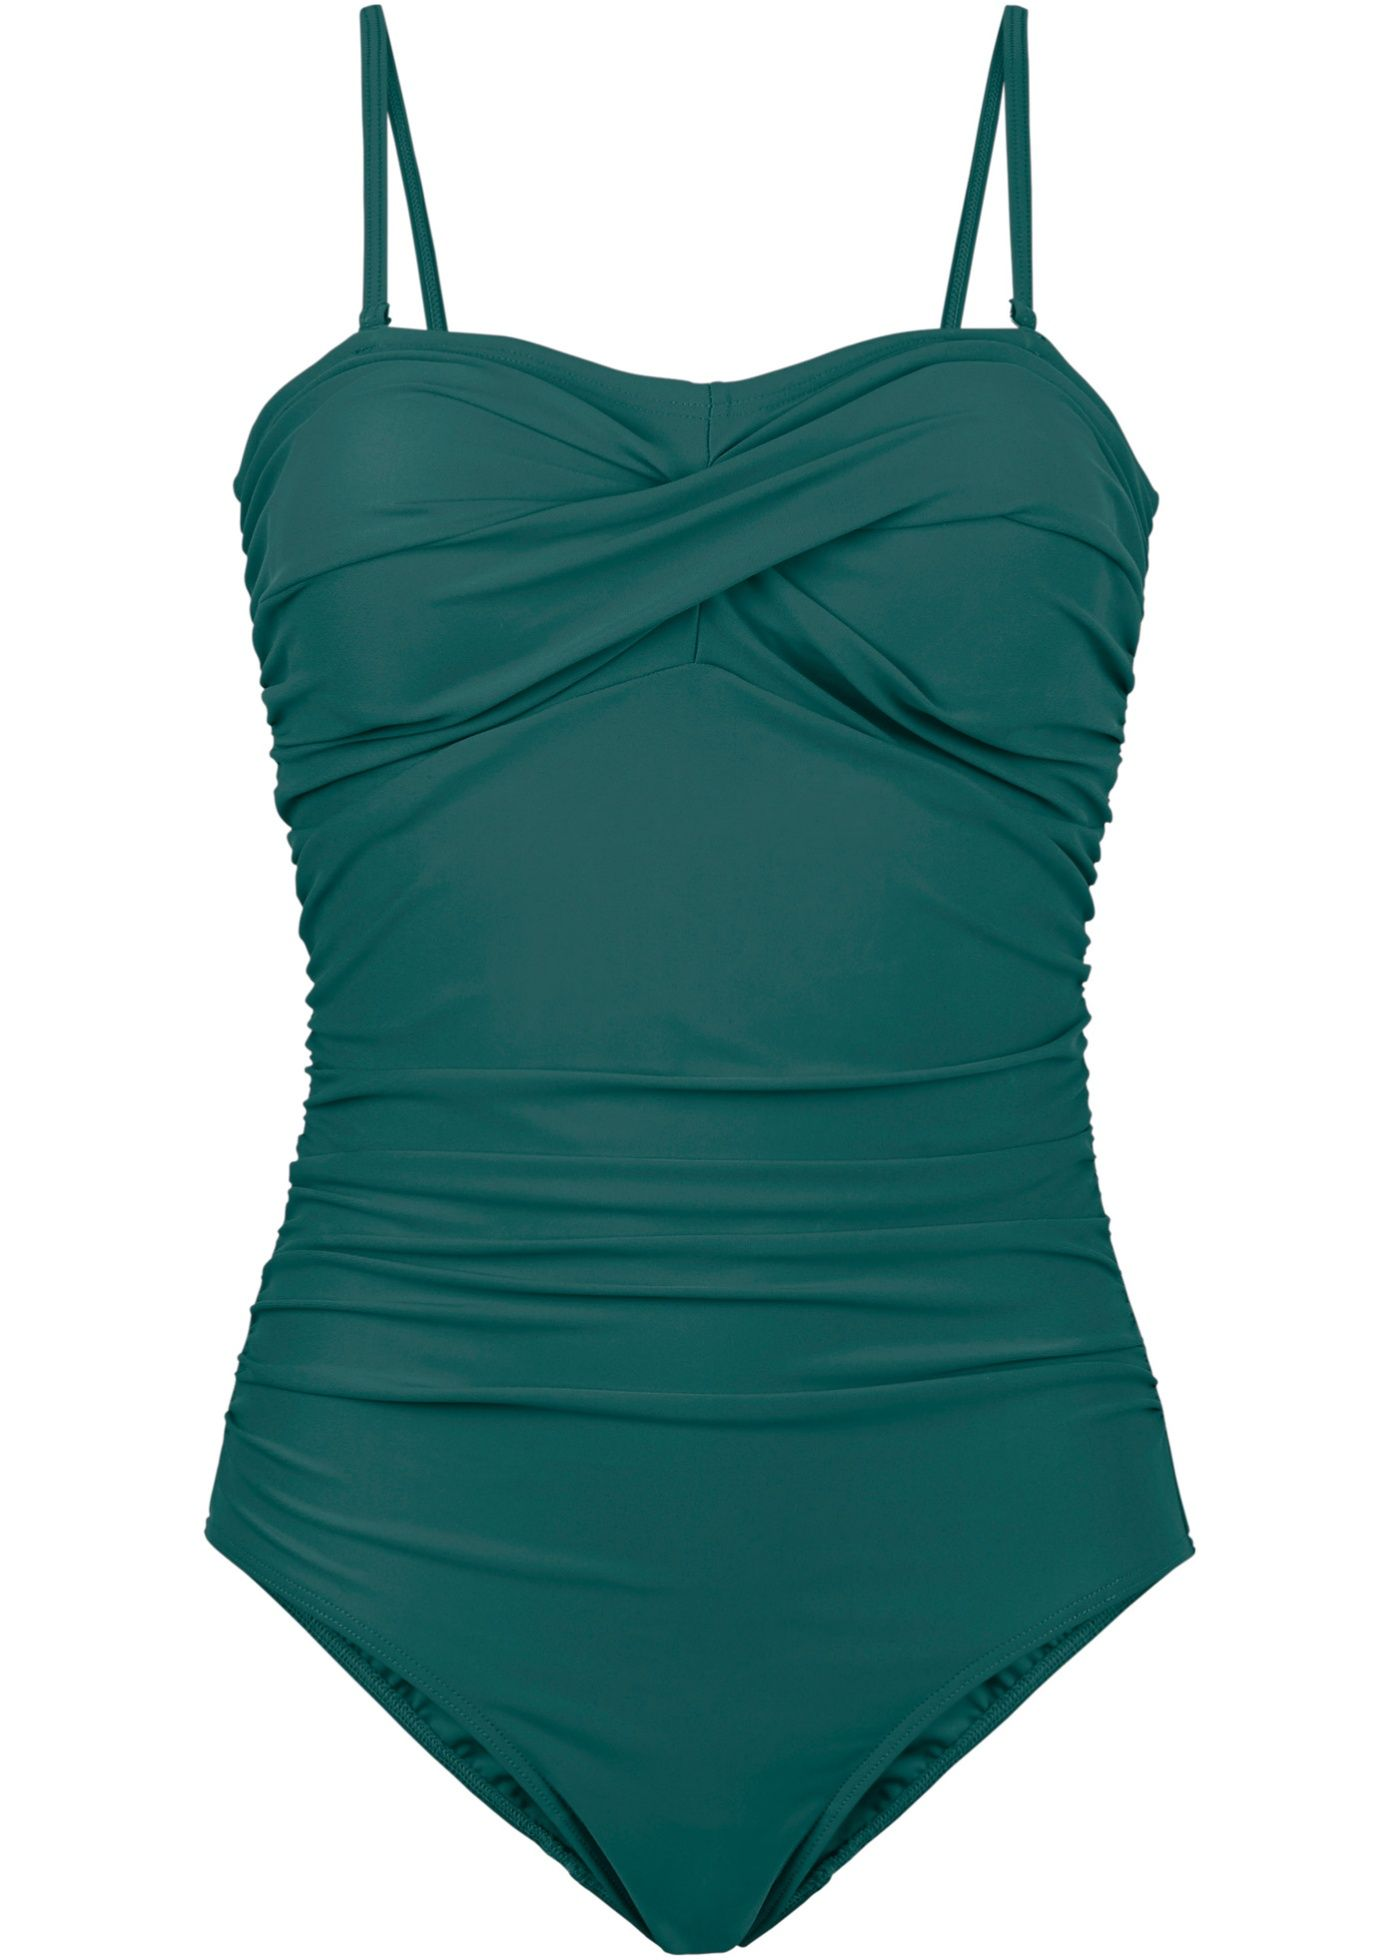 328c8c89c2ea65 Corrigerend badpak smaragdgroen - bpc selection nu in de onlineshop van  bonprix.nl vanaf ?